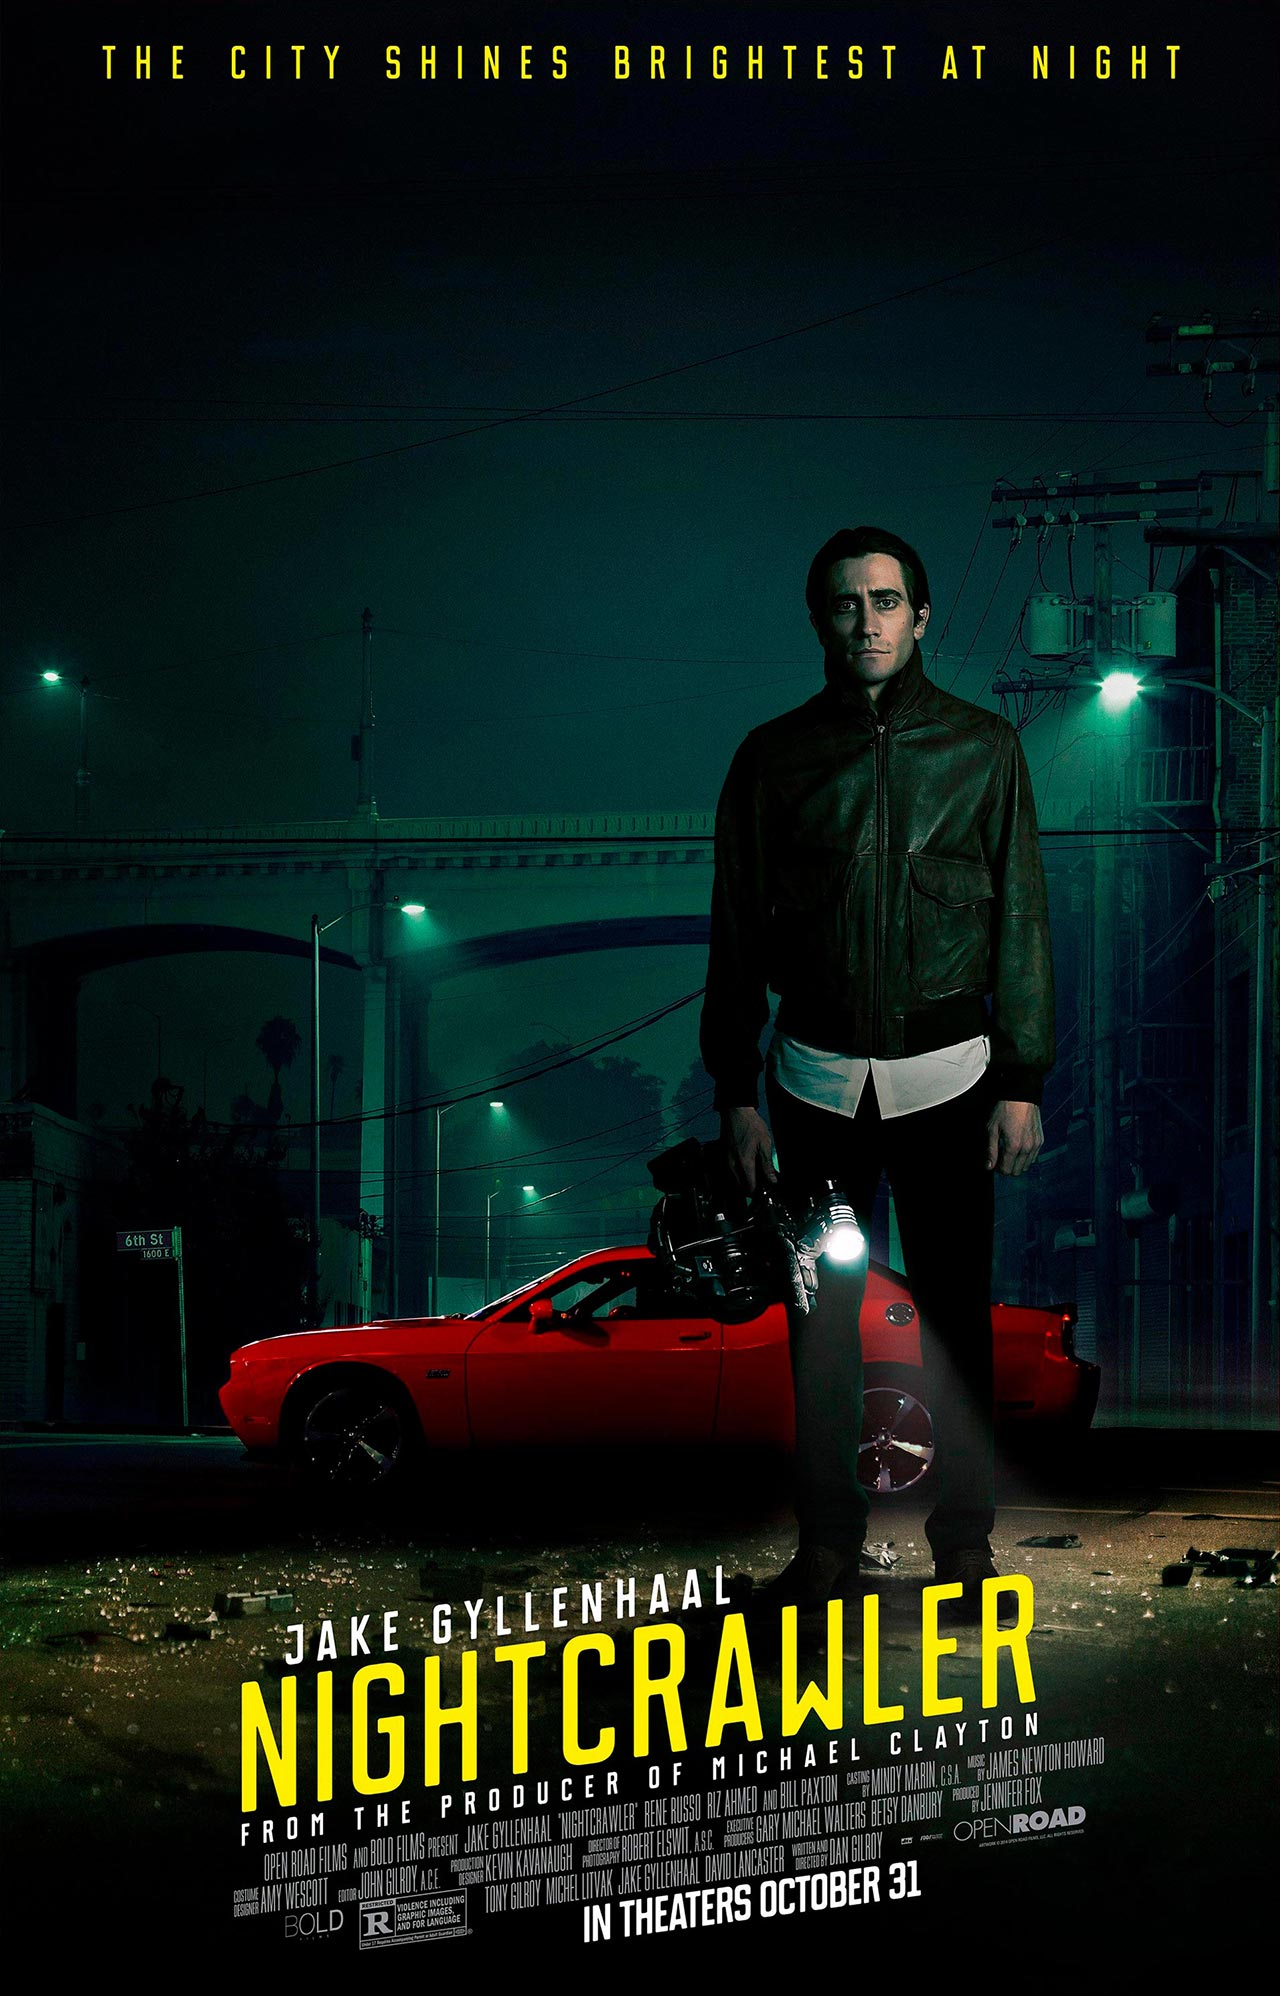 nightcrawler gyllenhaal poster